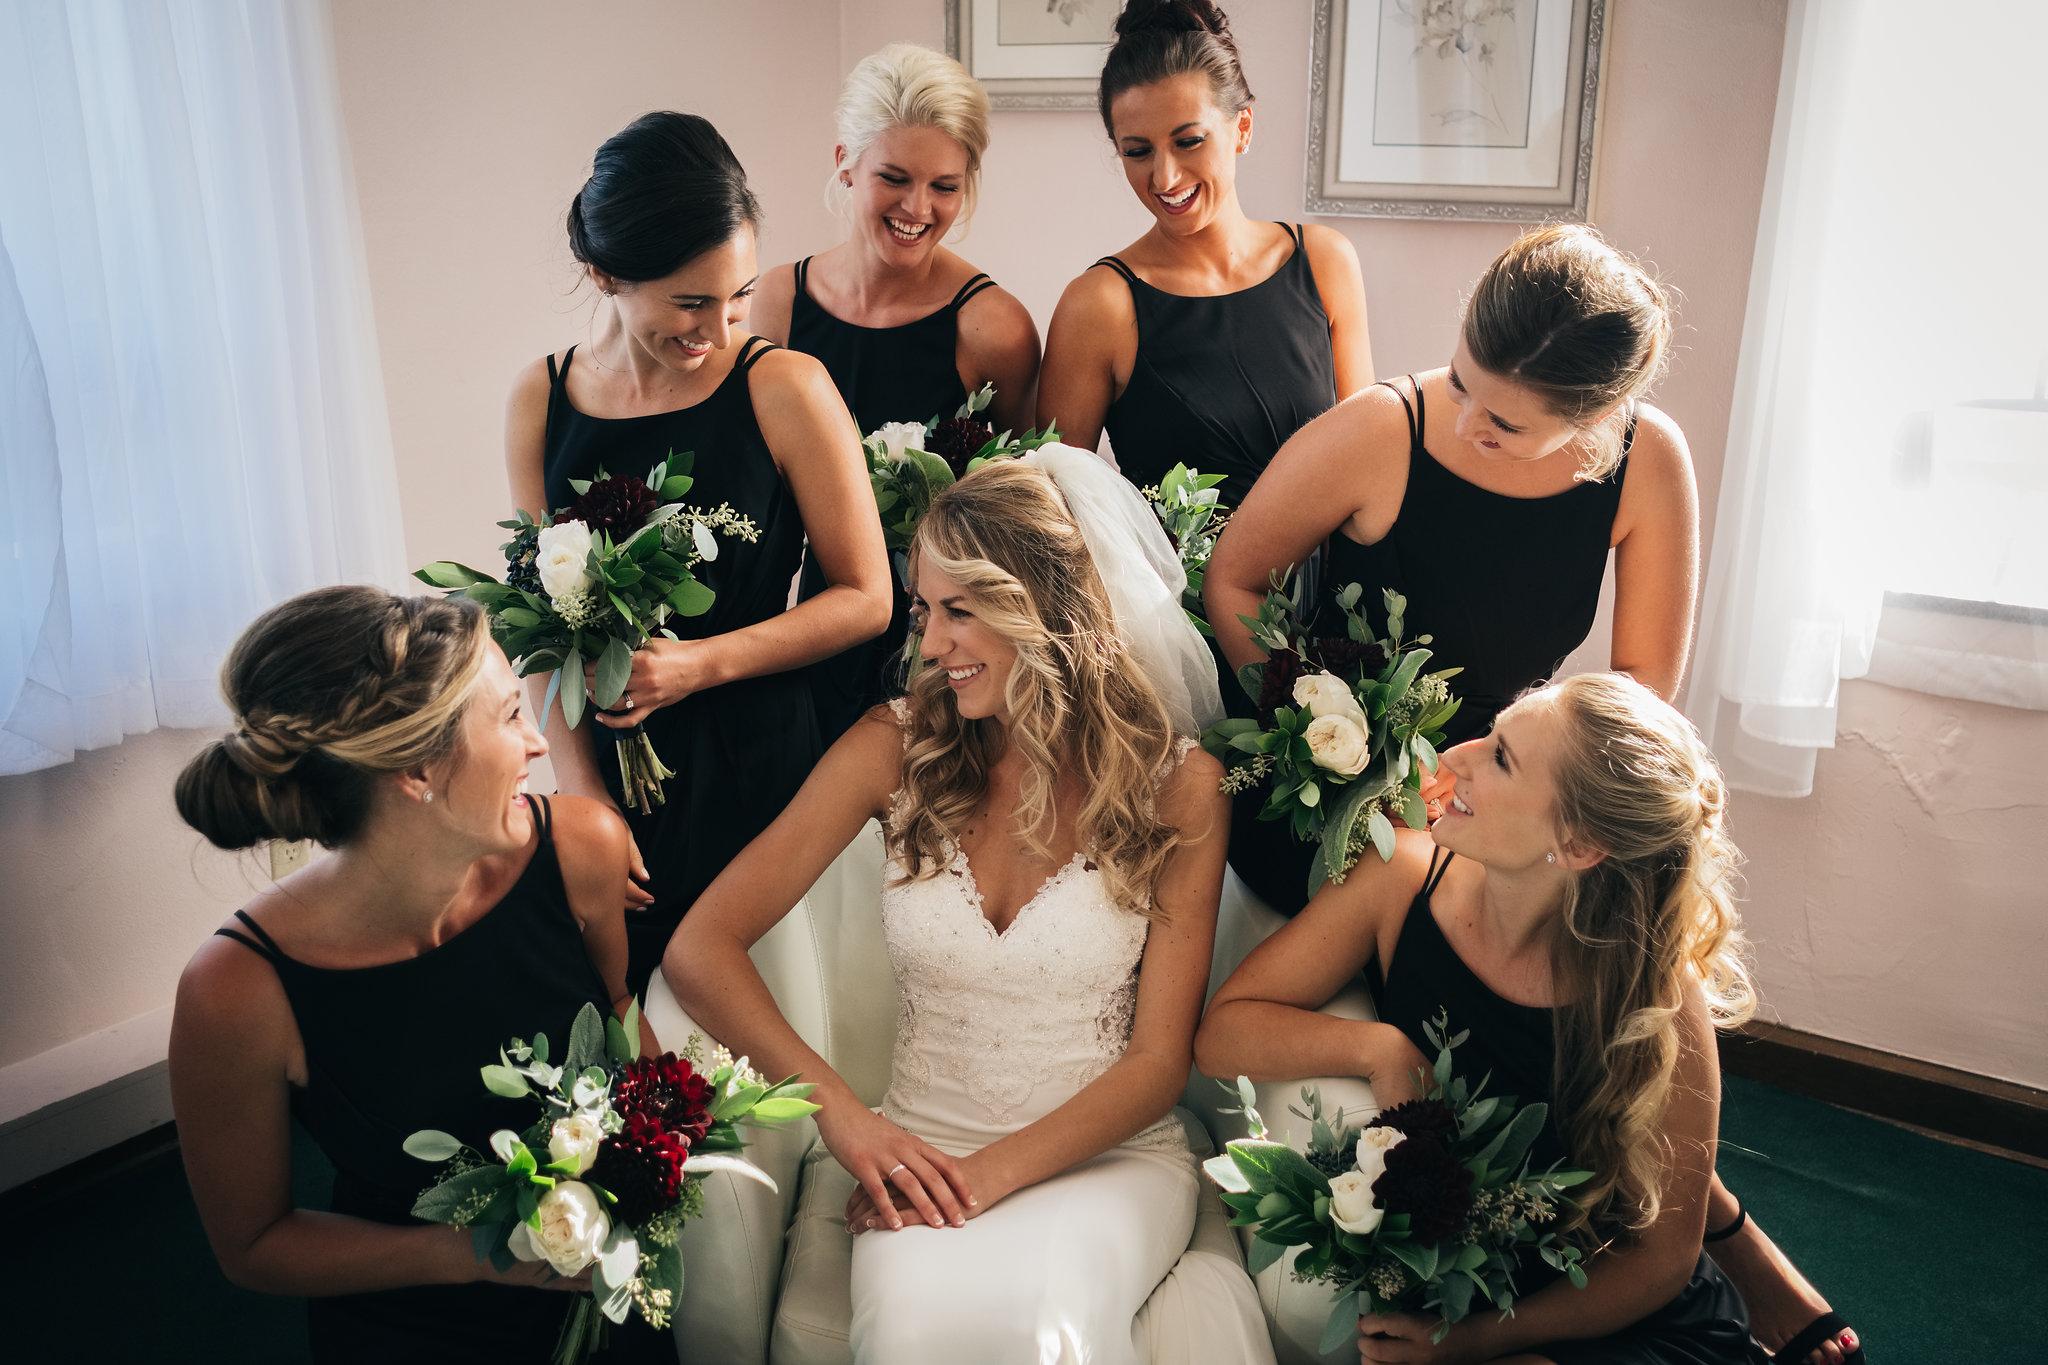 Bridesmaids Gather Around Bride on Wedding Day for Wedding Photographers